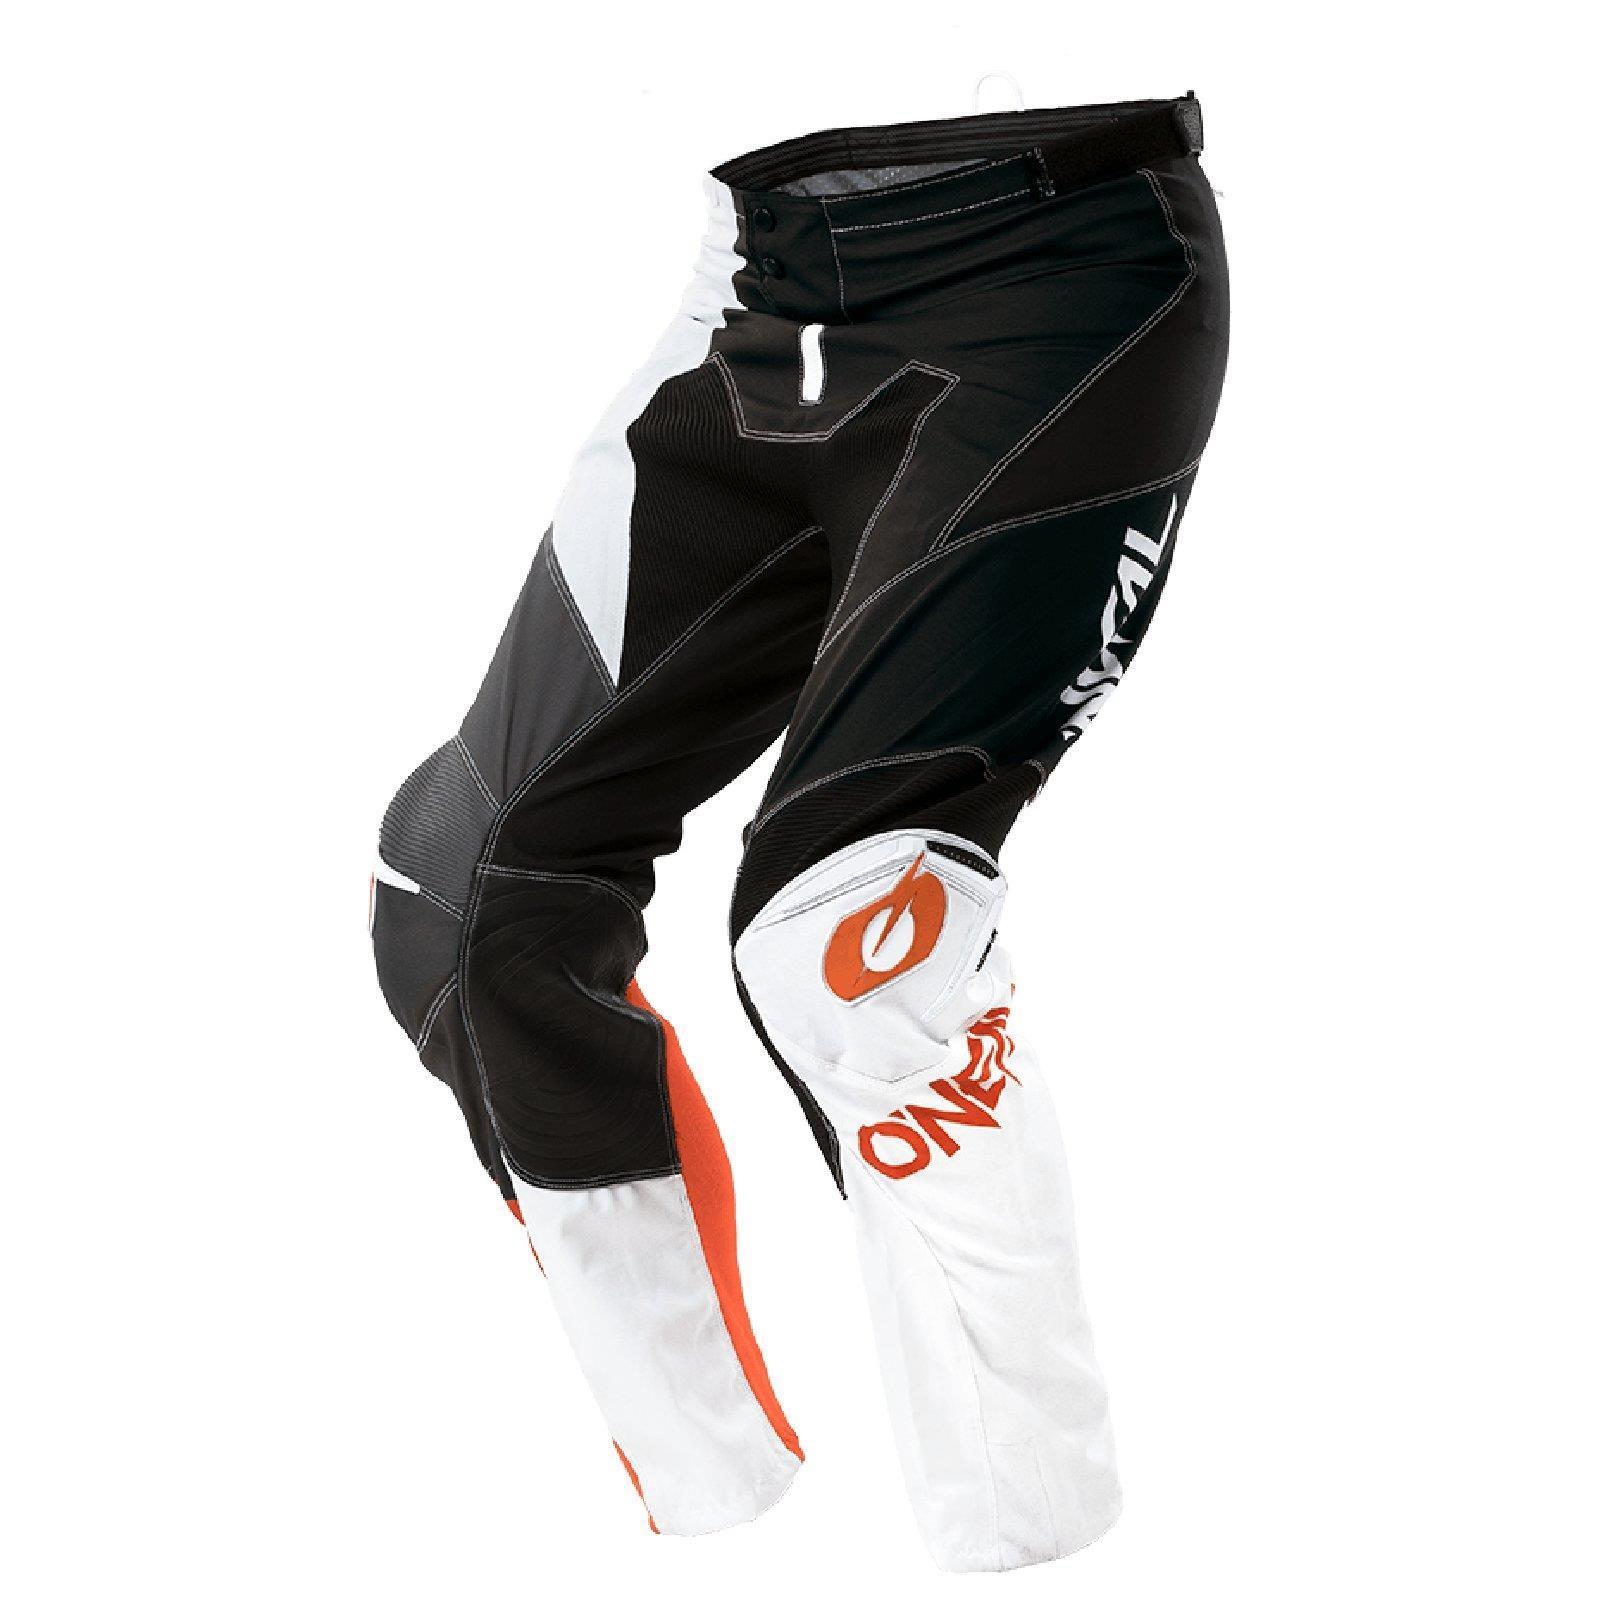 Bicicleta-de-montana-Enduro-MTB-downhill-pantalones-los-pantalones-oNeal-mayhem-que-Lite-split-Moto miniatura 12